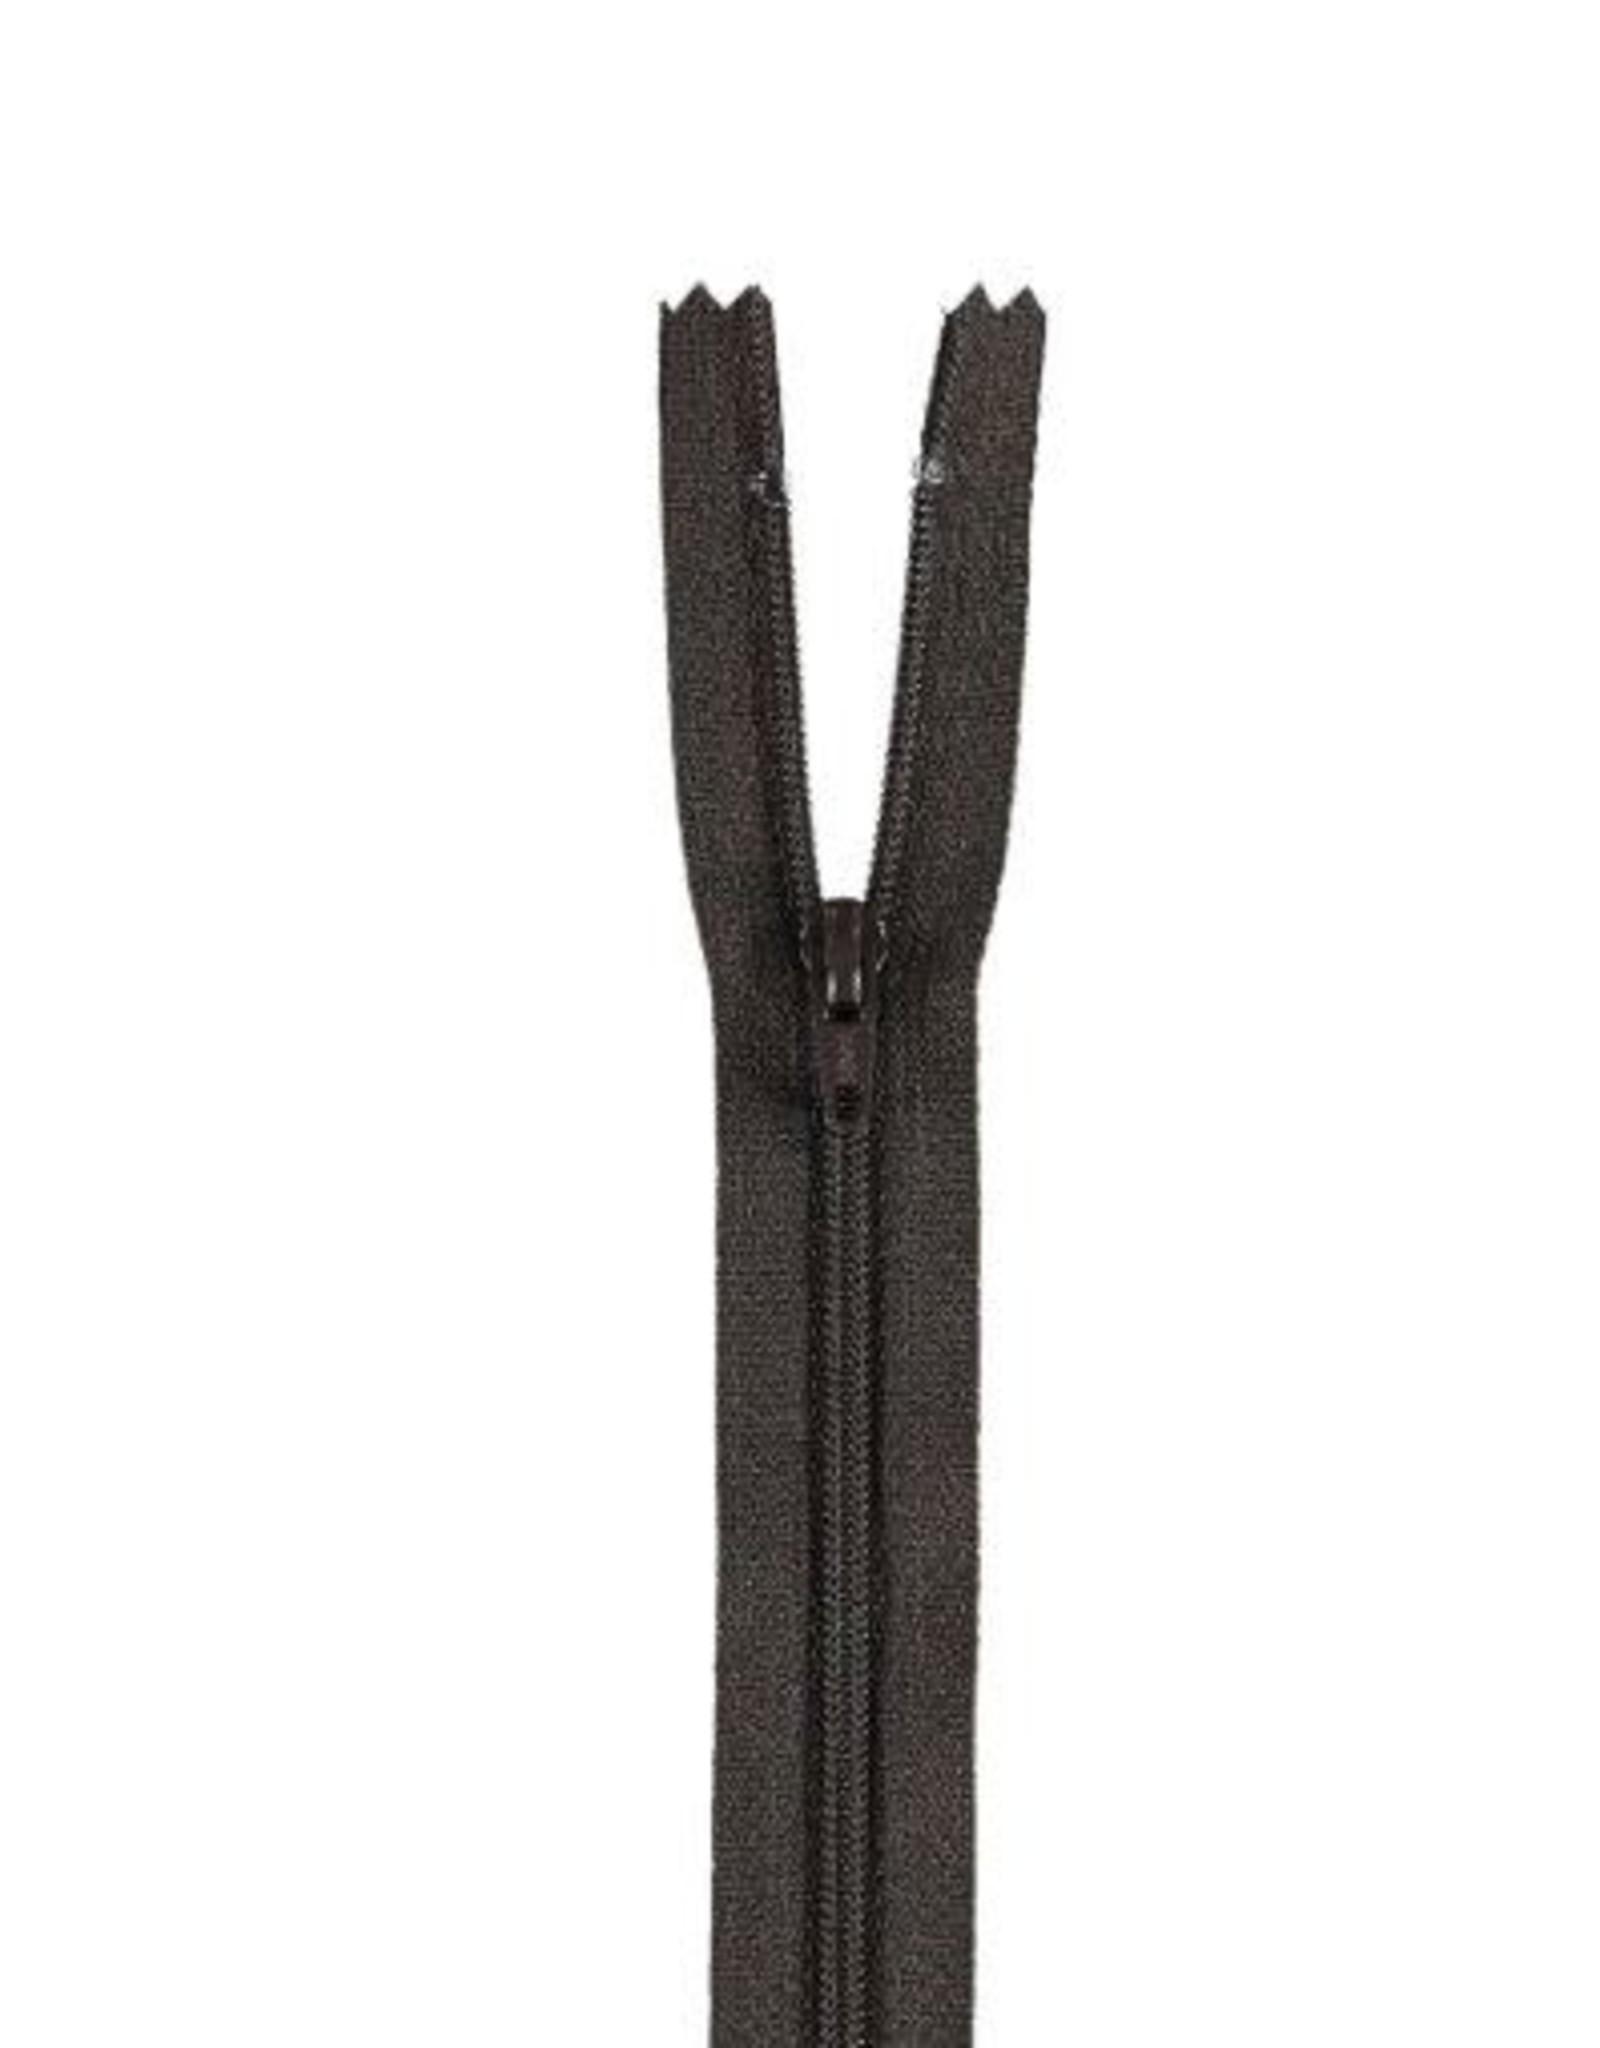 YKK Spiraalrits niet-DB 3mm zwart bruin 916-30cm